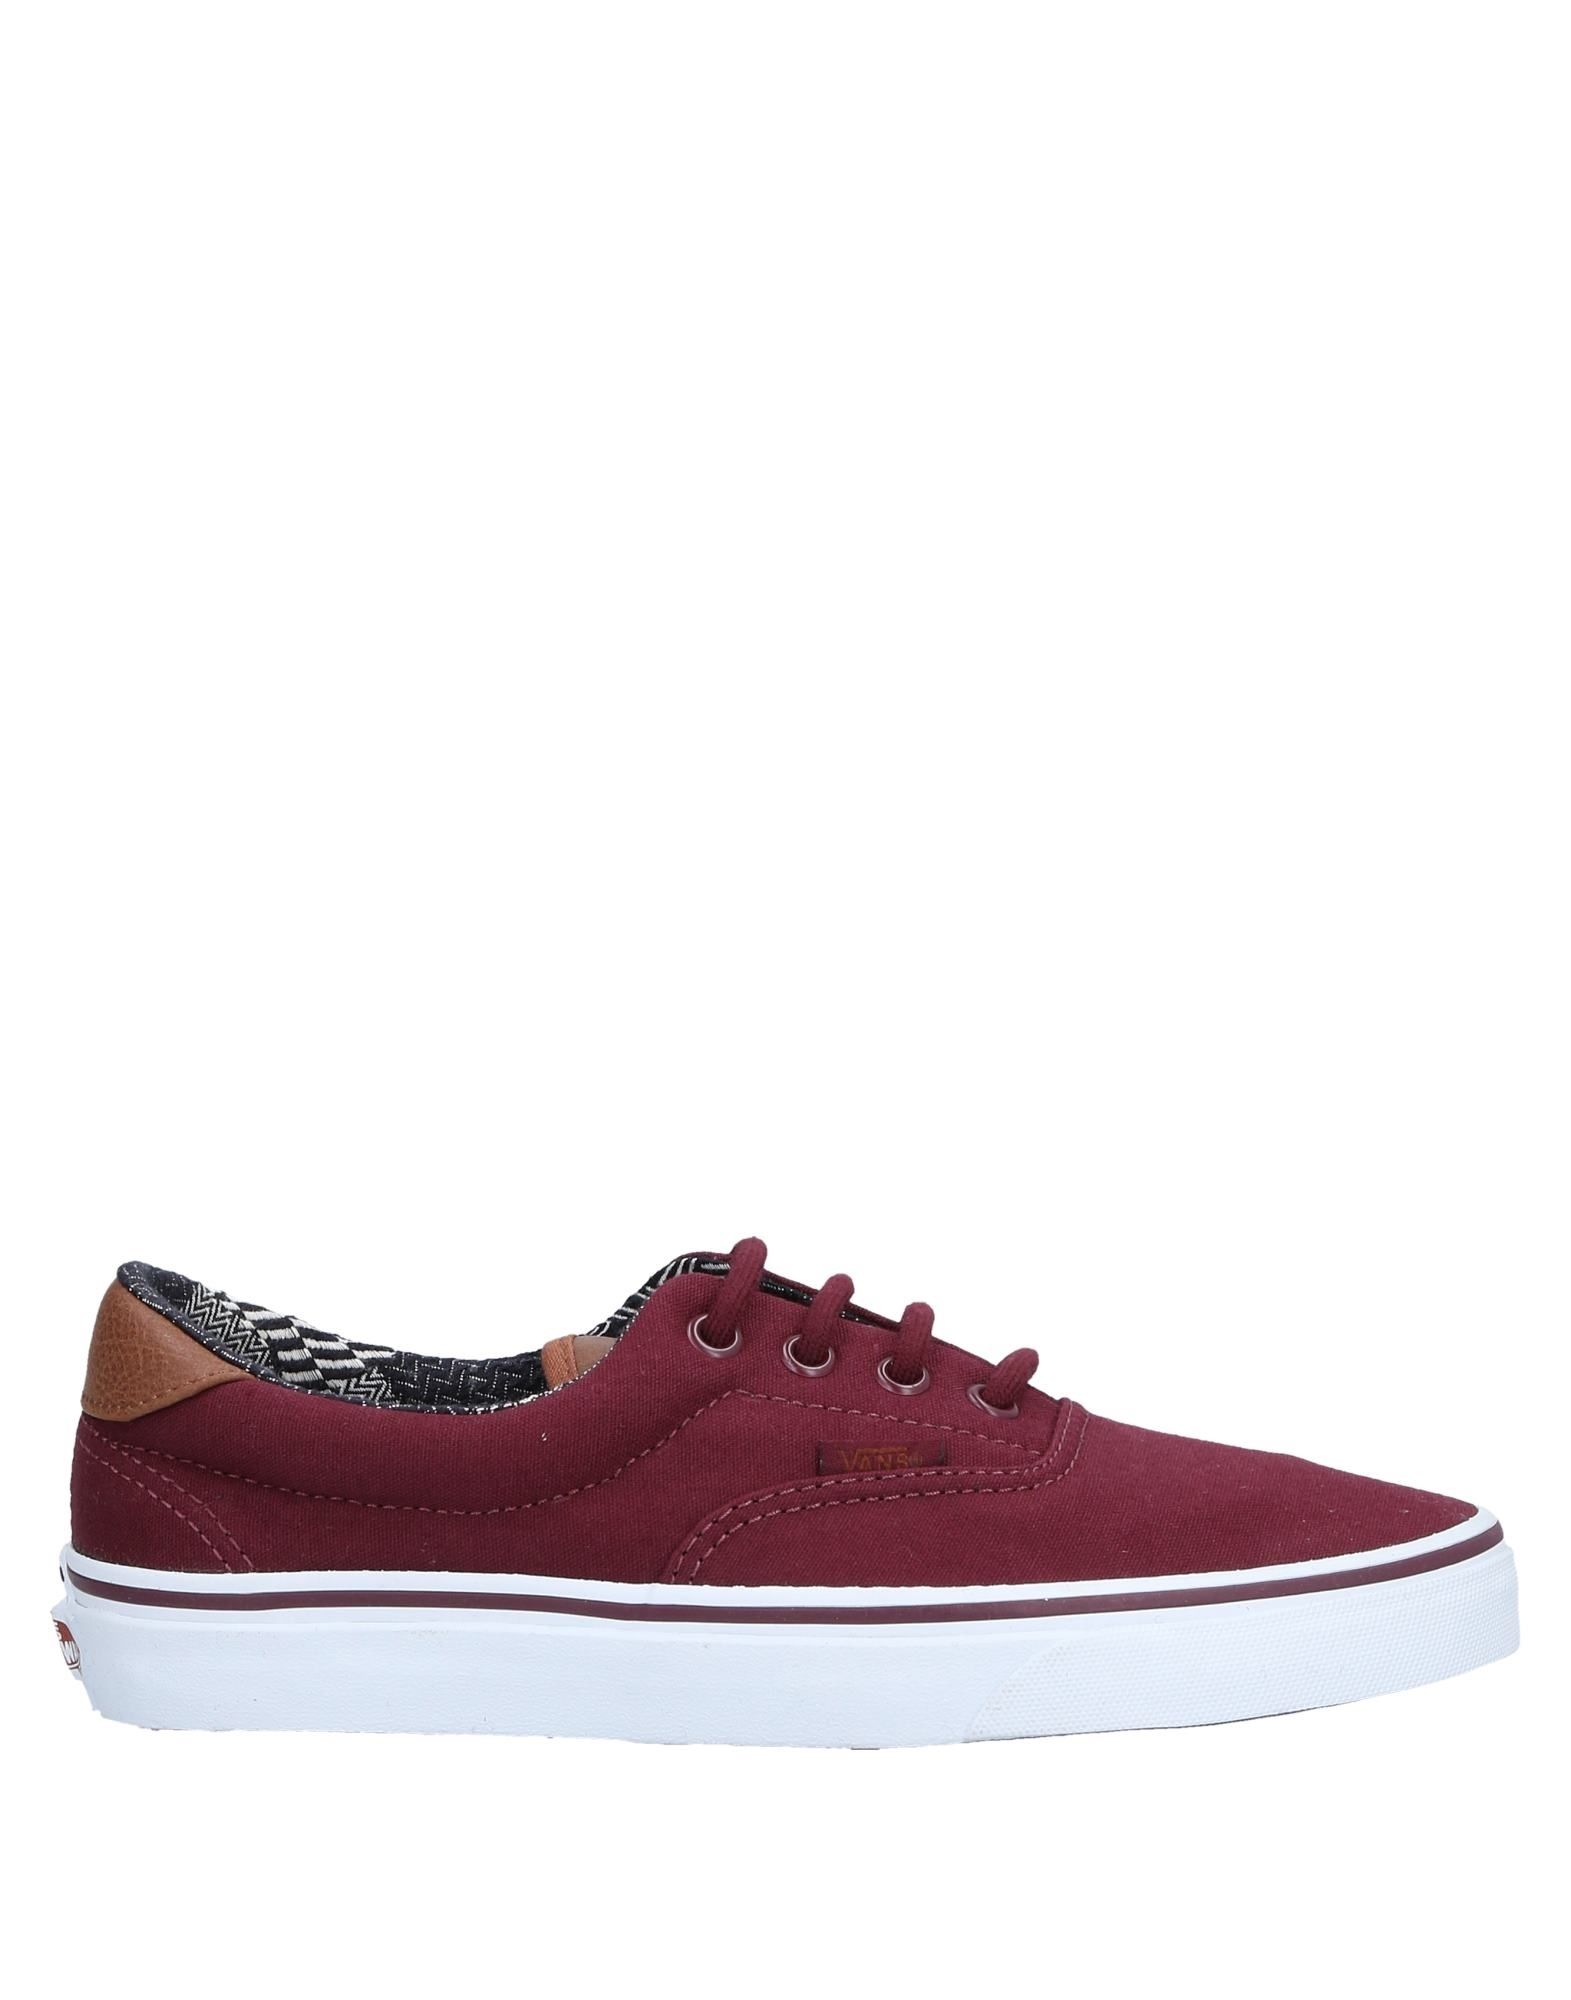 Vans 11519914JU Sneakers Damen  11519914JU Vans Gute Qualität beliebte Schuhe 4f8784